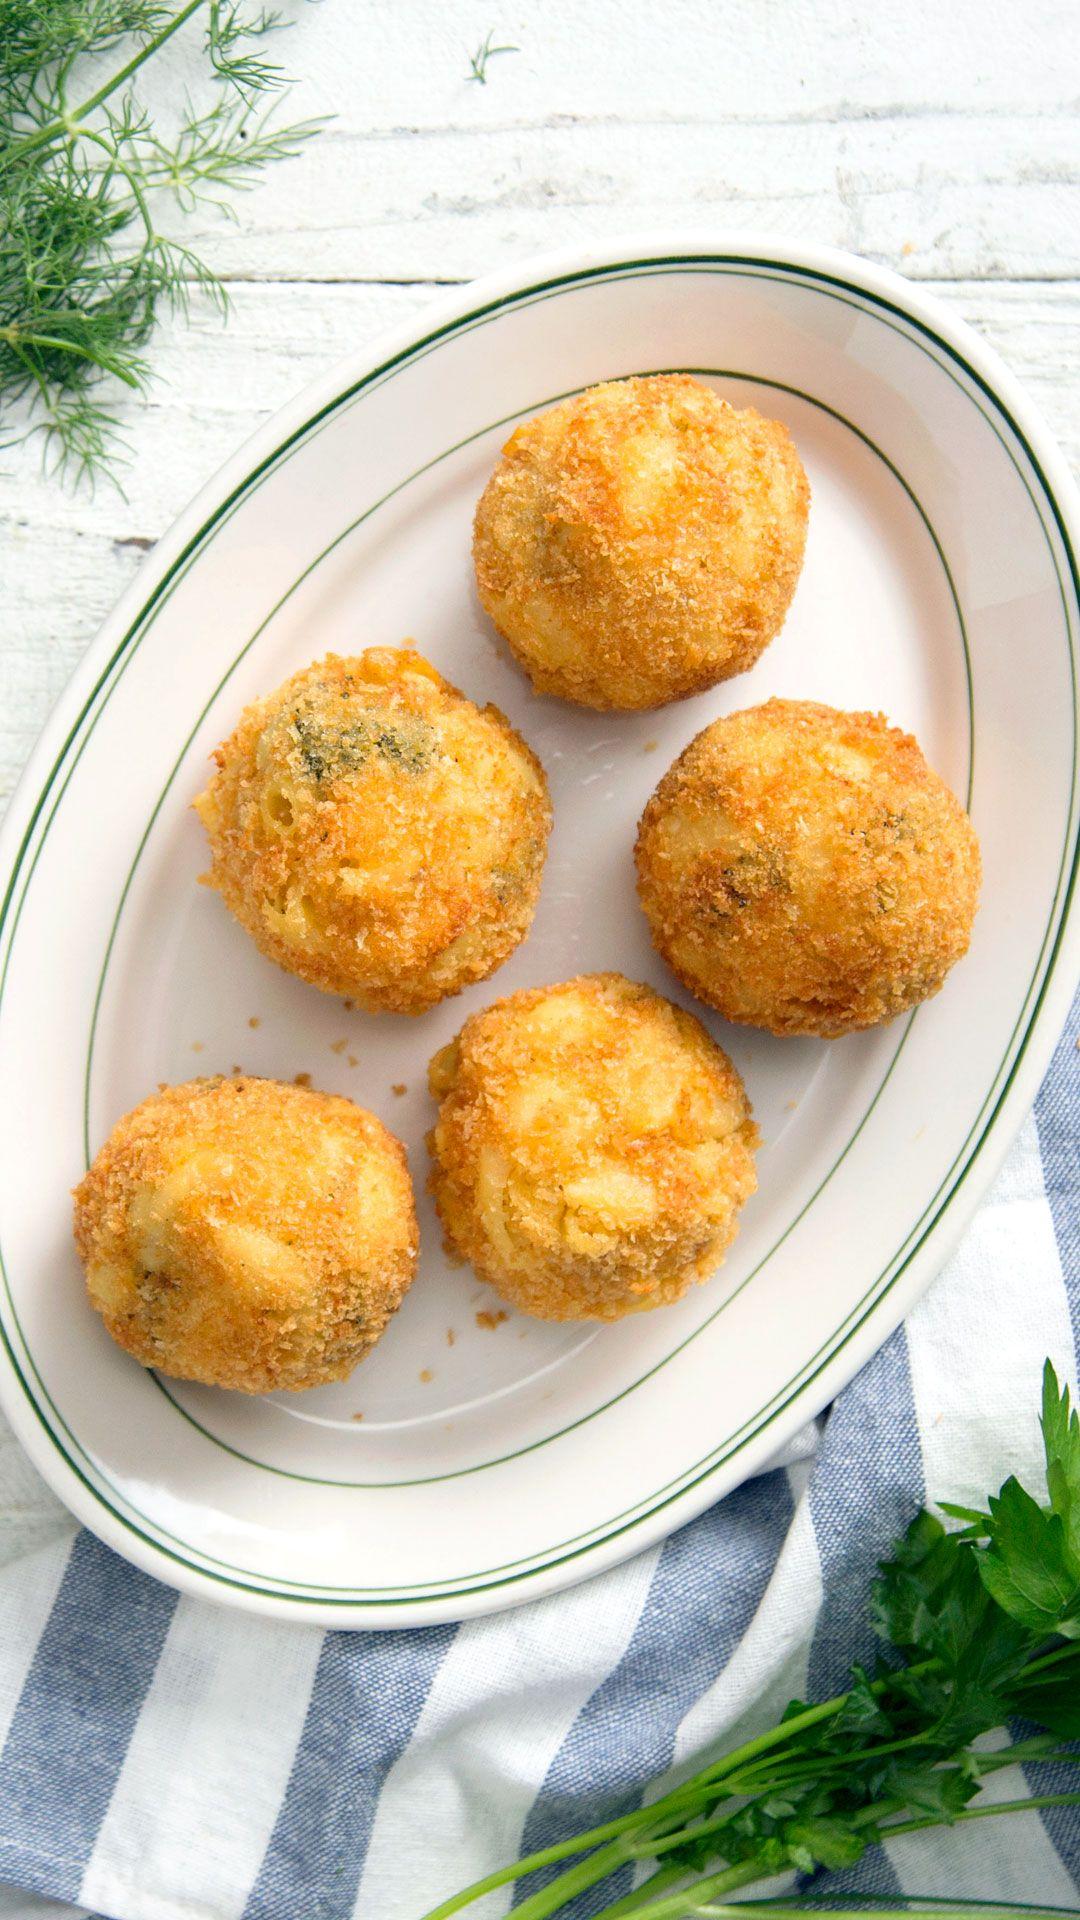 Broccoli Cheddar Potato Mac and Cheese Bombs